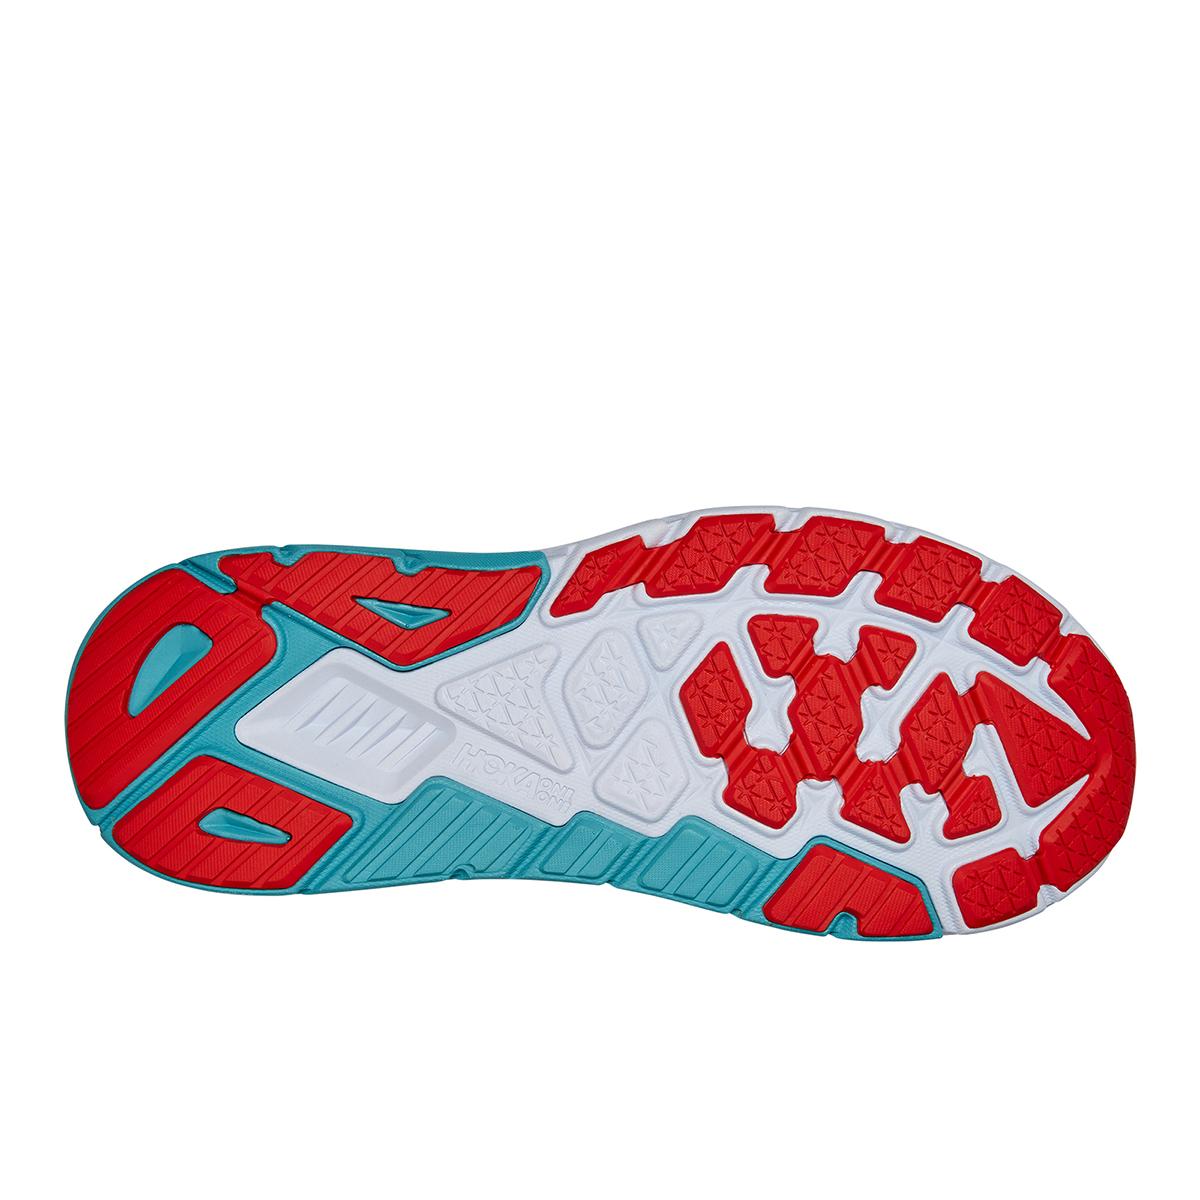 Men's Hoka One One Arahi 5 Running Shoe - Color: Harbor Mist / Aquarelle - Size: 7 - Width: Regular, Harbor Mist / Aquarelle, large, image 4